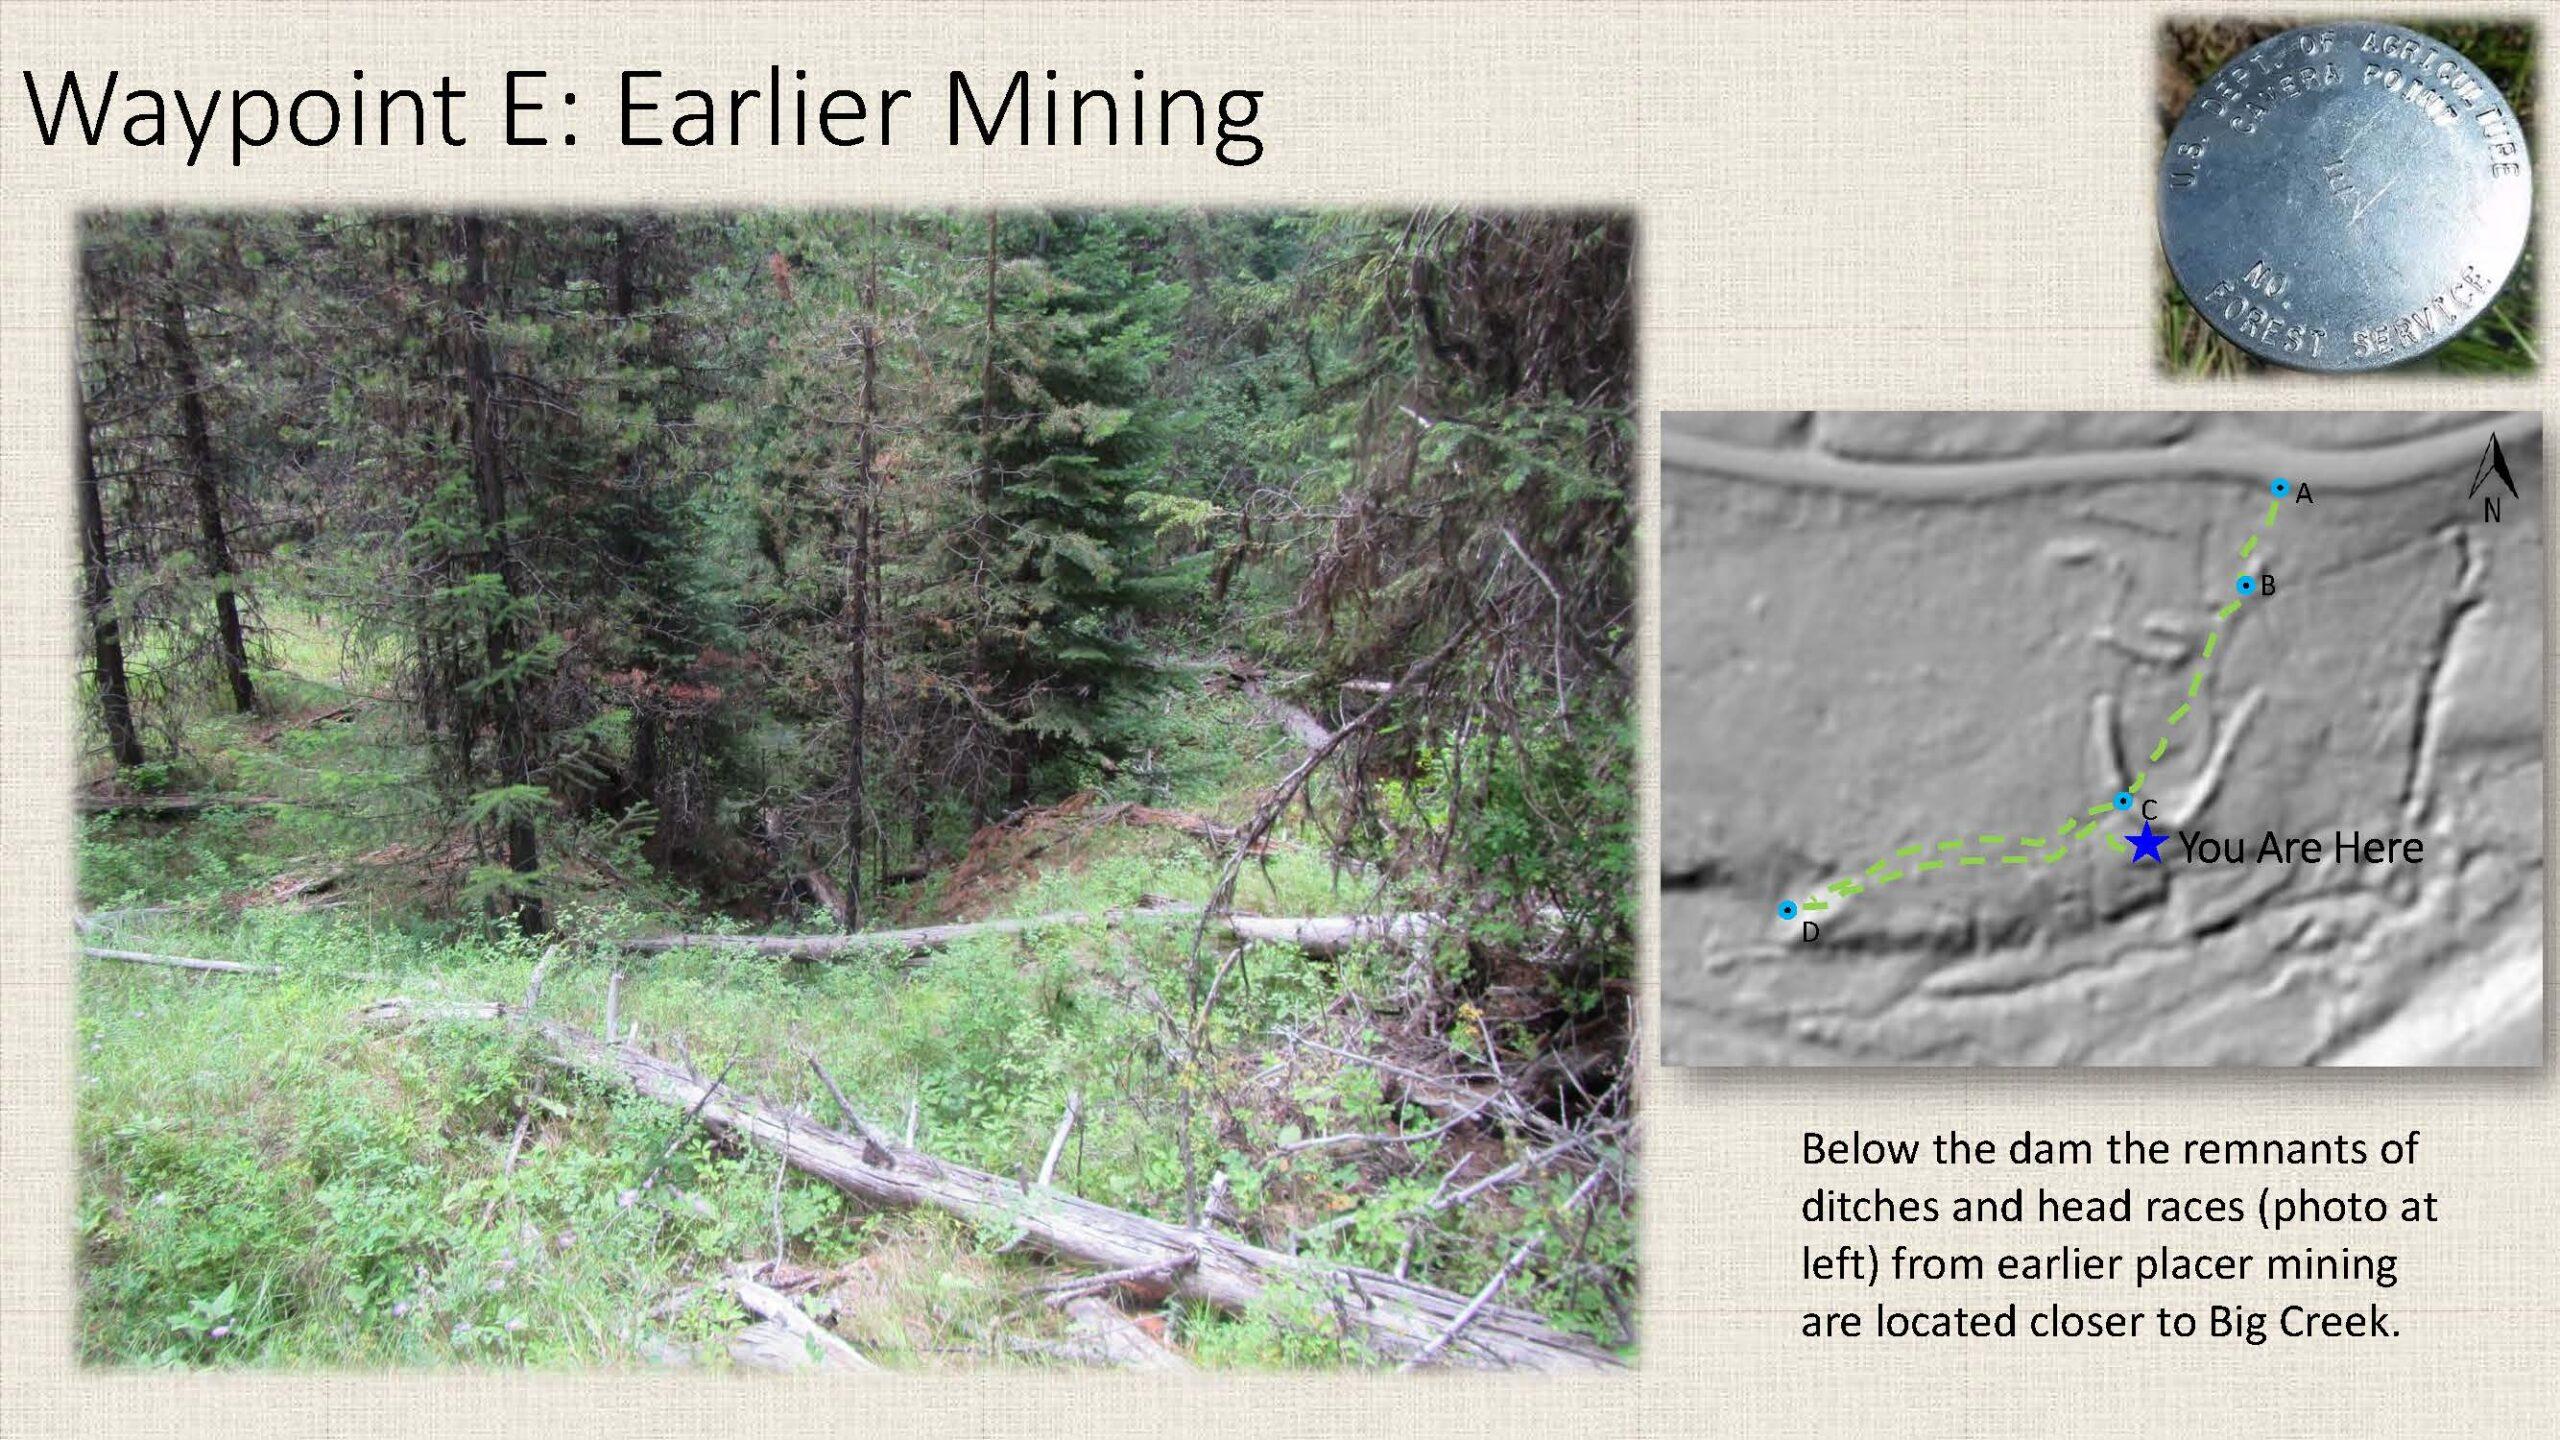 Waypoint E: Earlier Mining